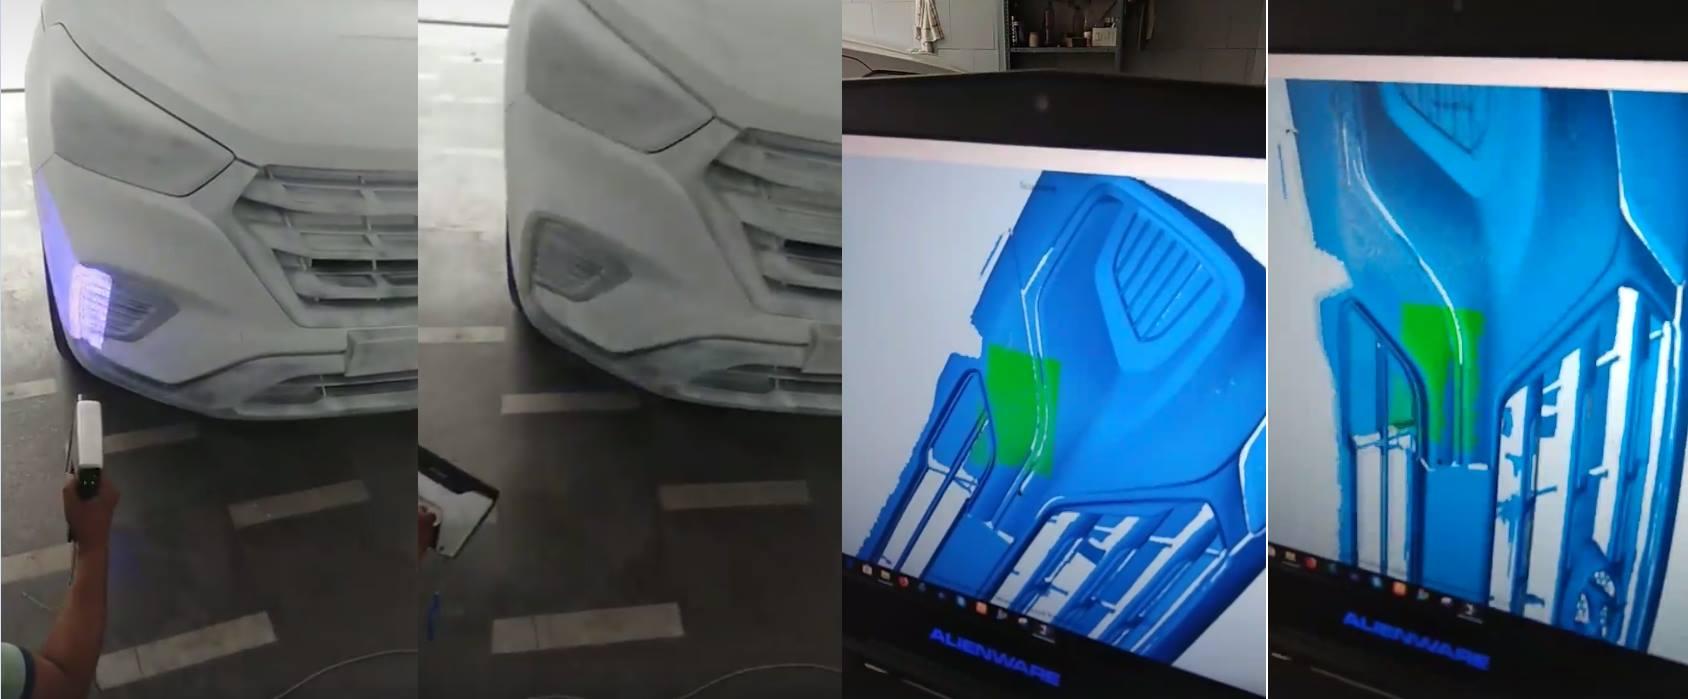 Nitin Jhamb Using the Einscan Pro 3D Scanner For Hyundai Cars.